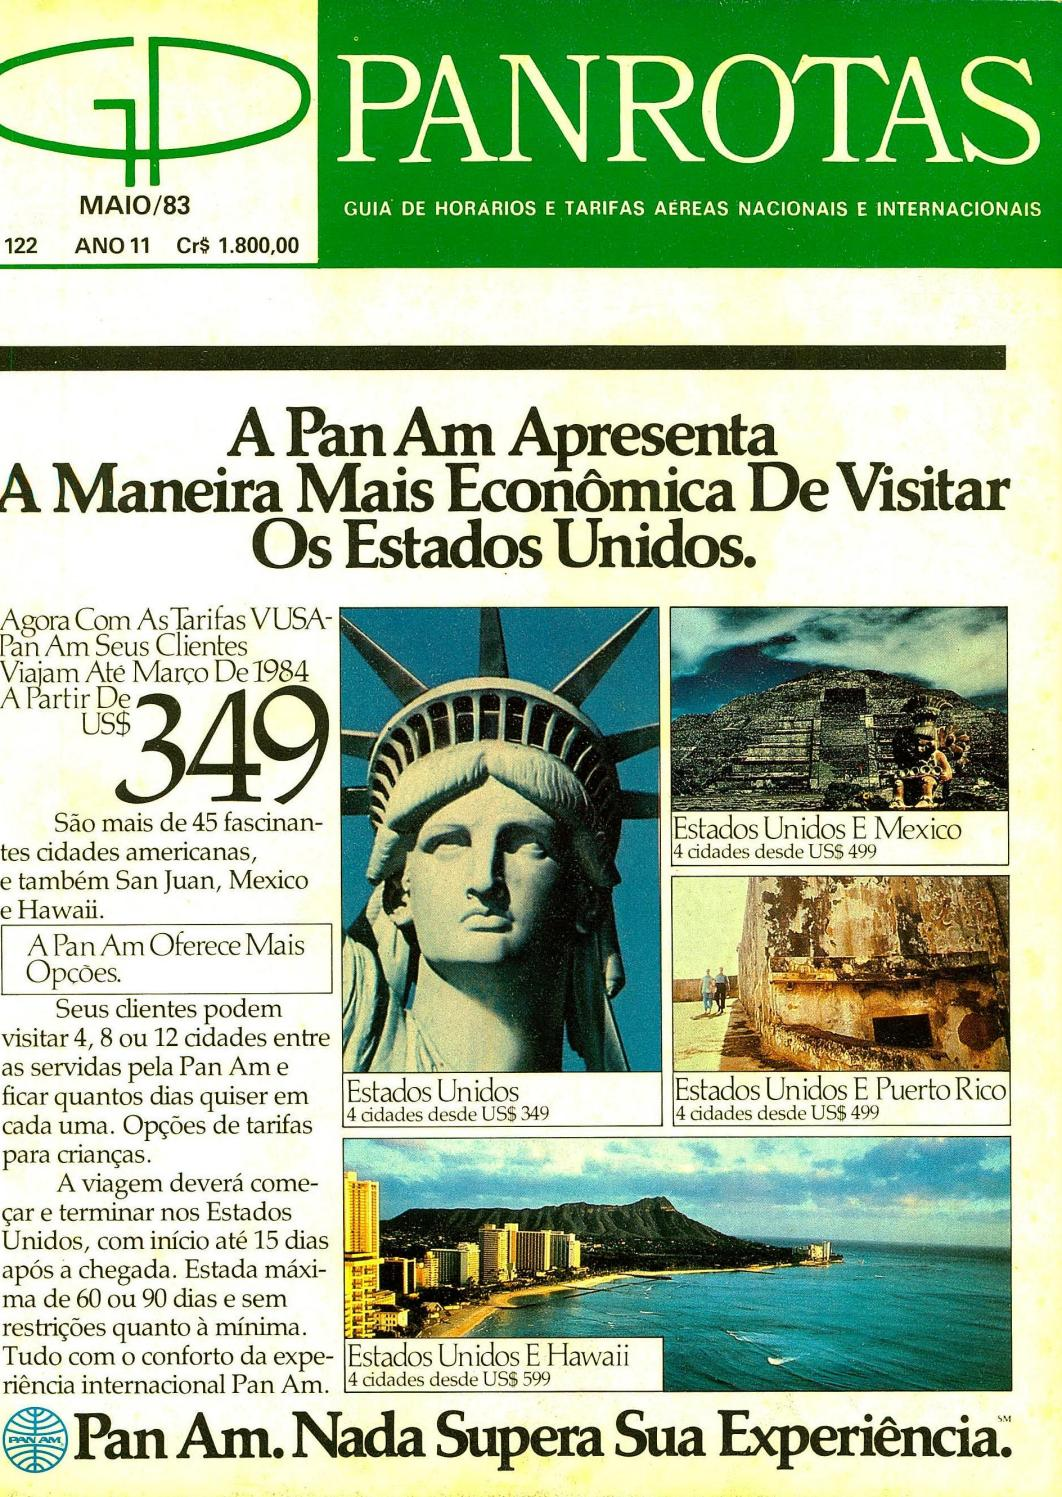 41b365b8619bd Guia PANROTAS - Edição 122 - Maio 1983 by PANROTAS Editora - issuu